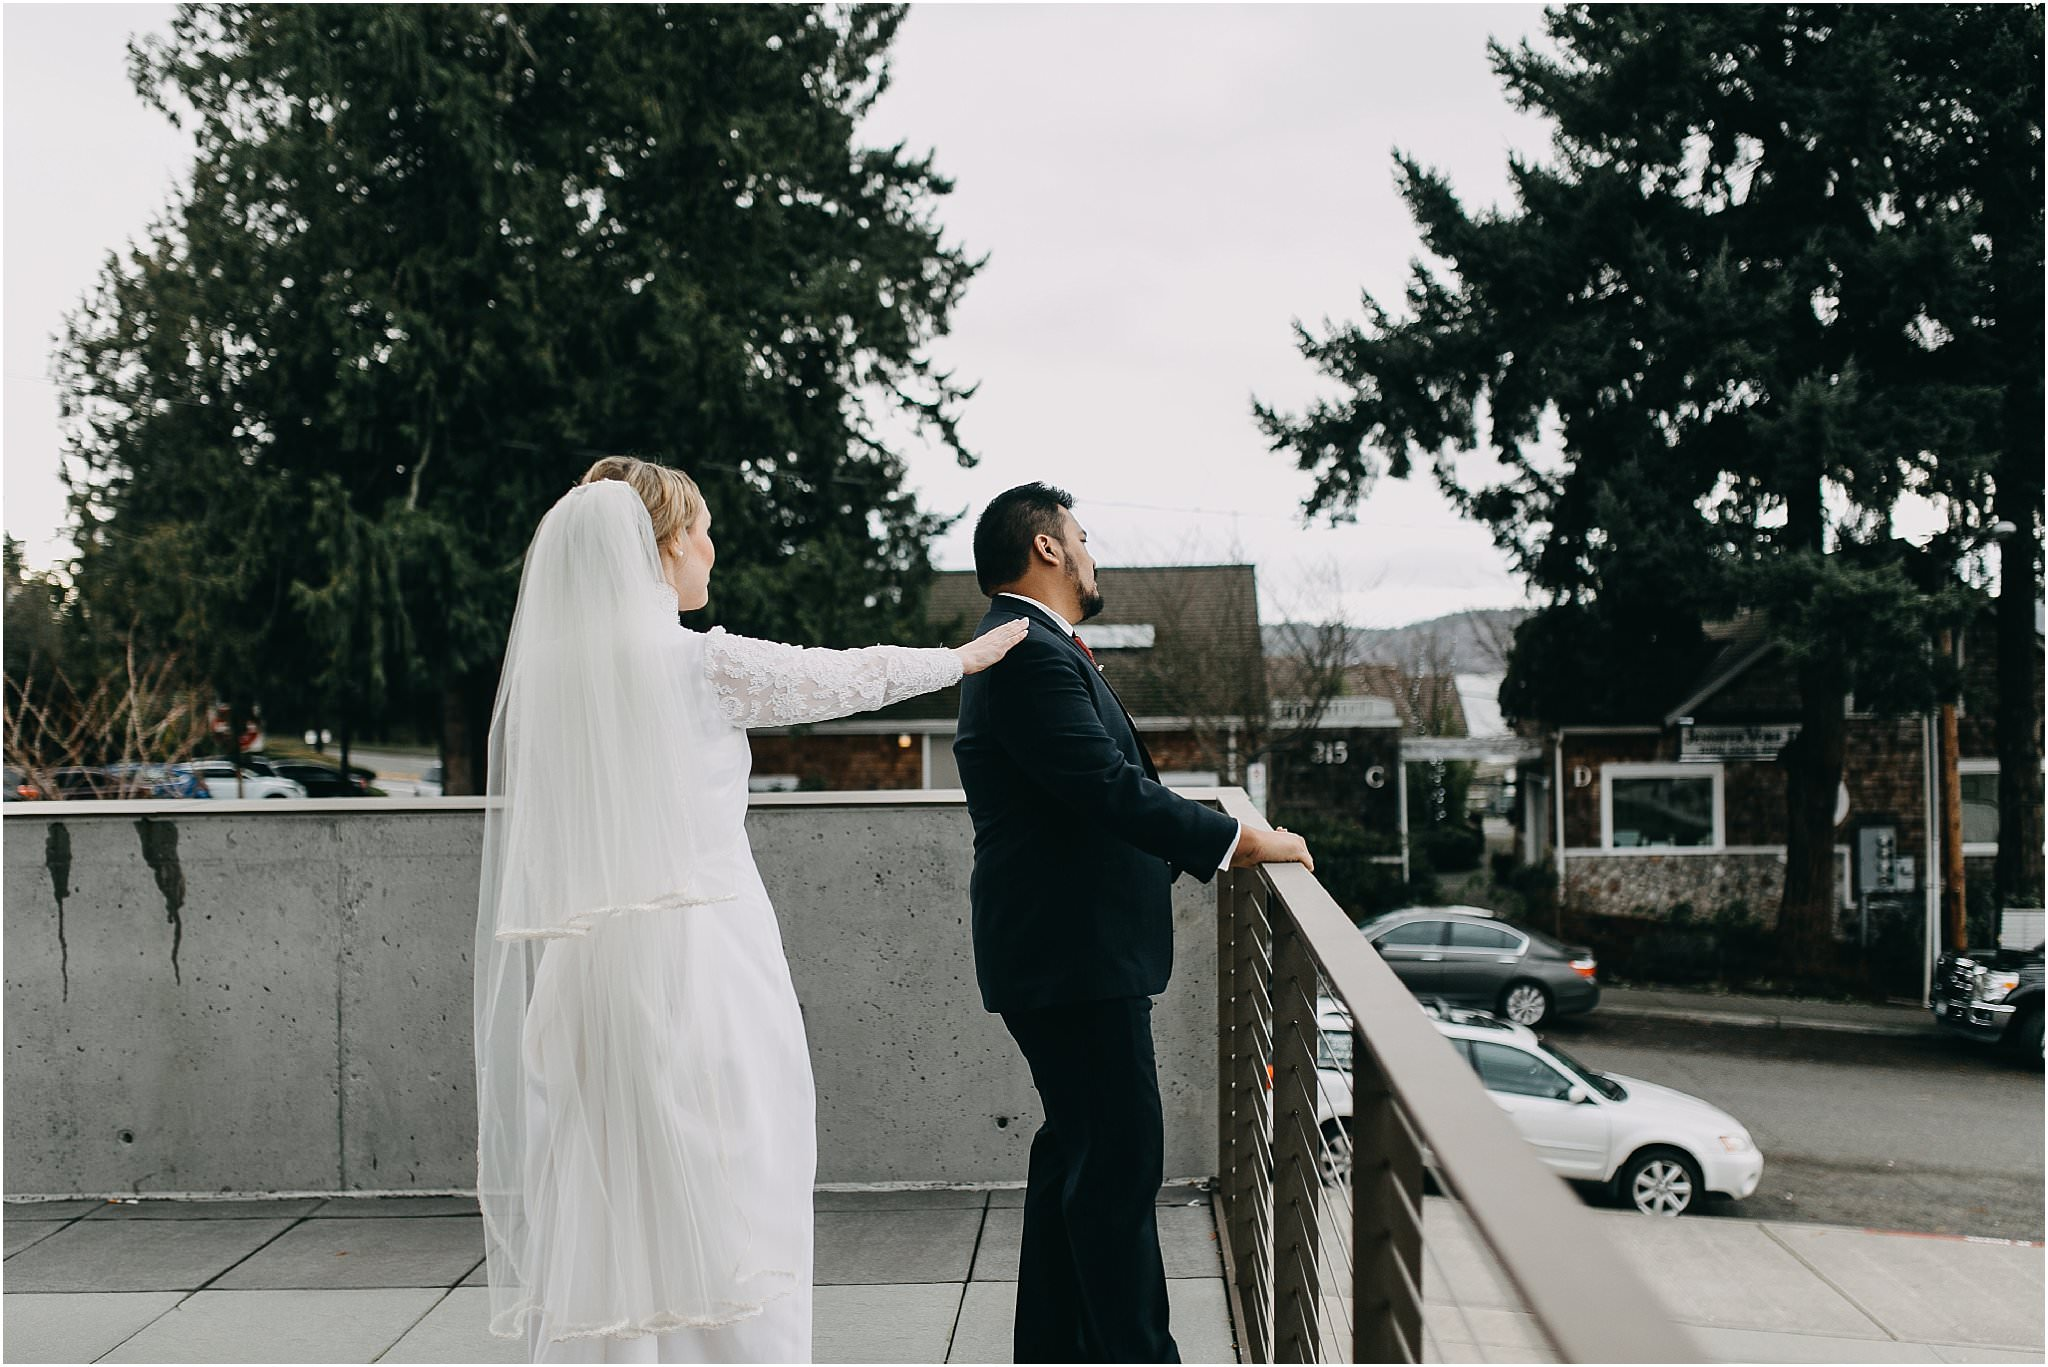 katy-robin-married-in-mukilteo-wedding16.jpg